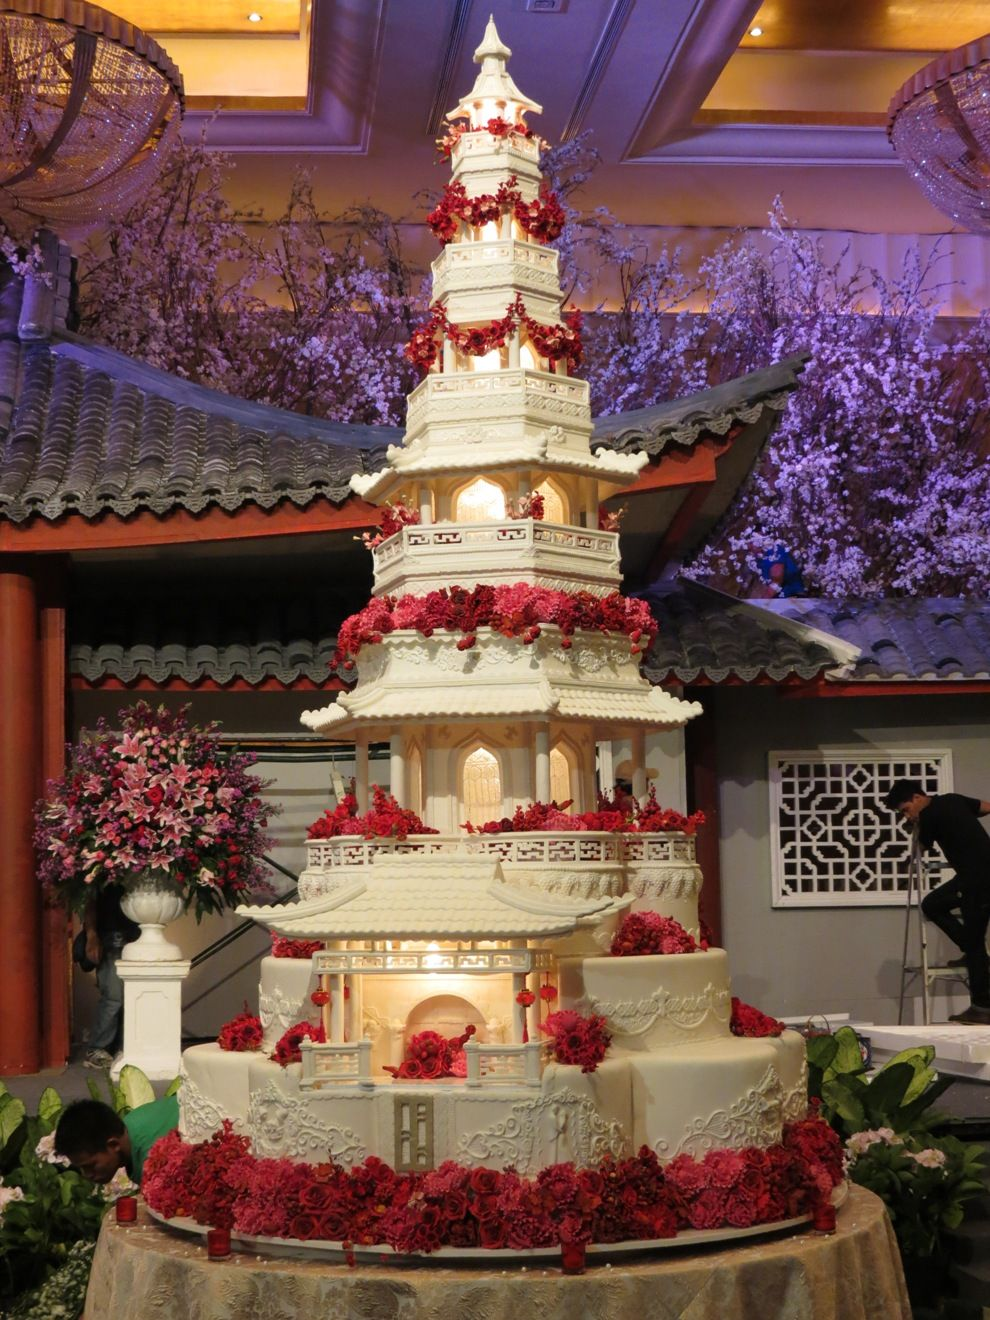 Wedding Cake White Red Flowers Extravagant wedding cakes